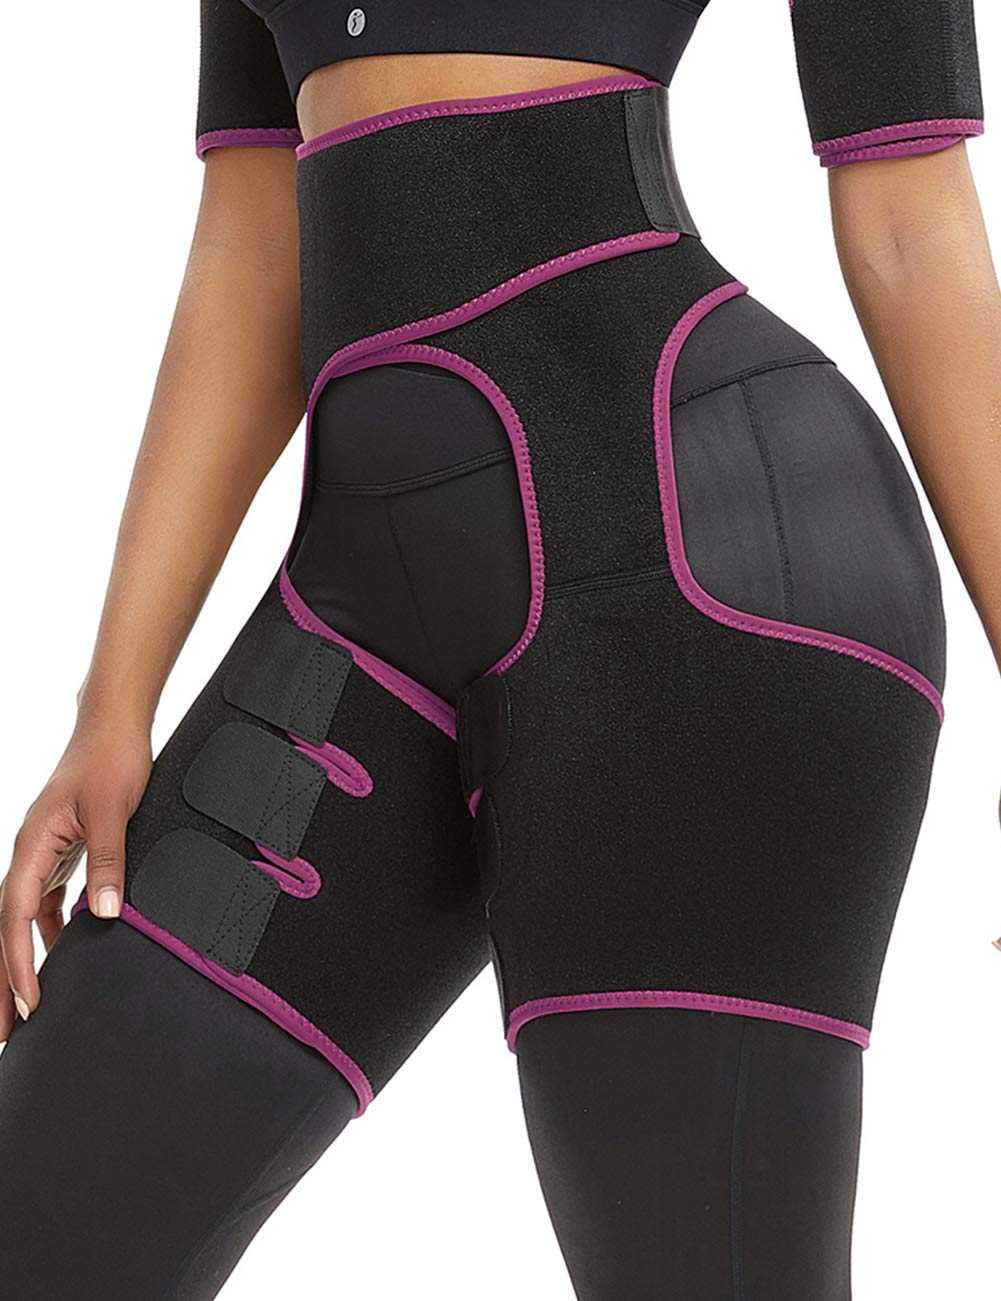 Groin Sciatica Relief Wrap Thigh Hamstring Compression Shapewear Thigh Support Neoprene Thigh Shapewear Waist Shaper